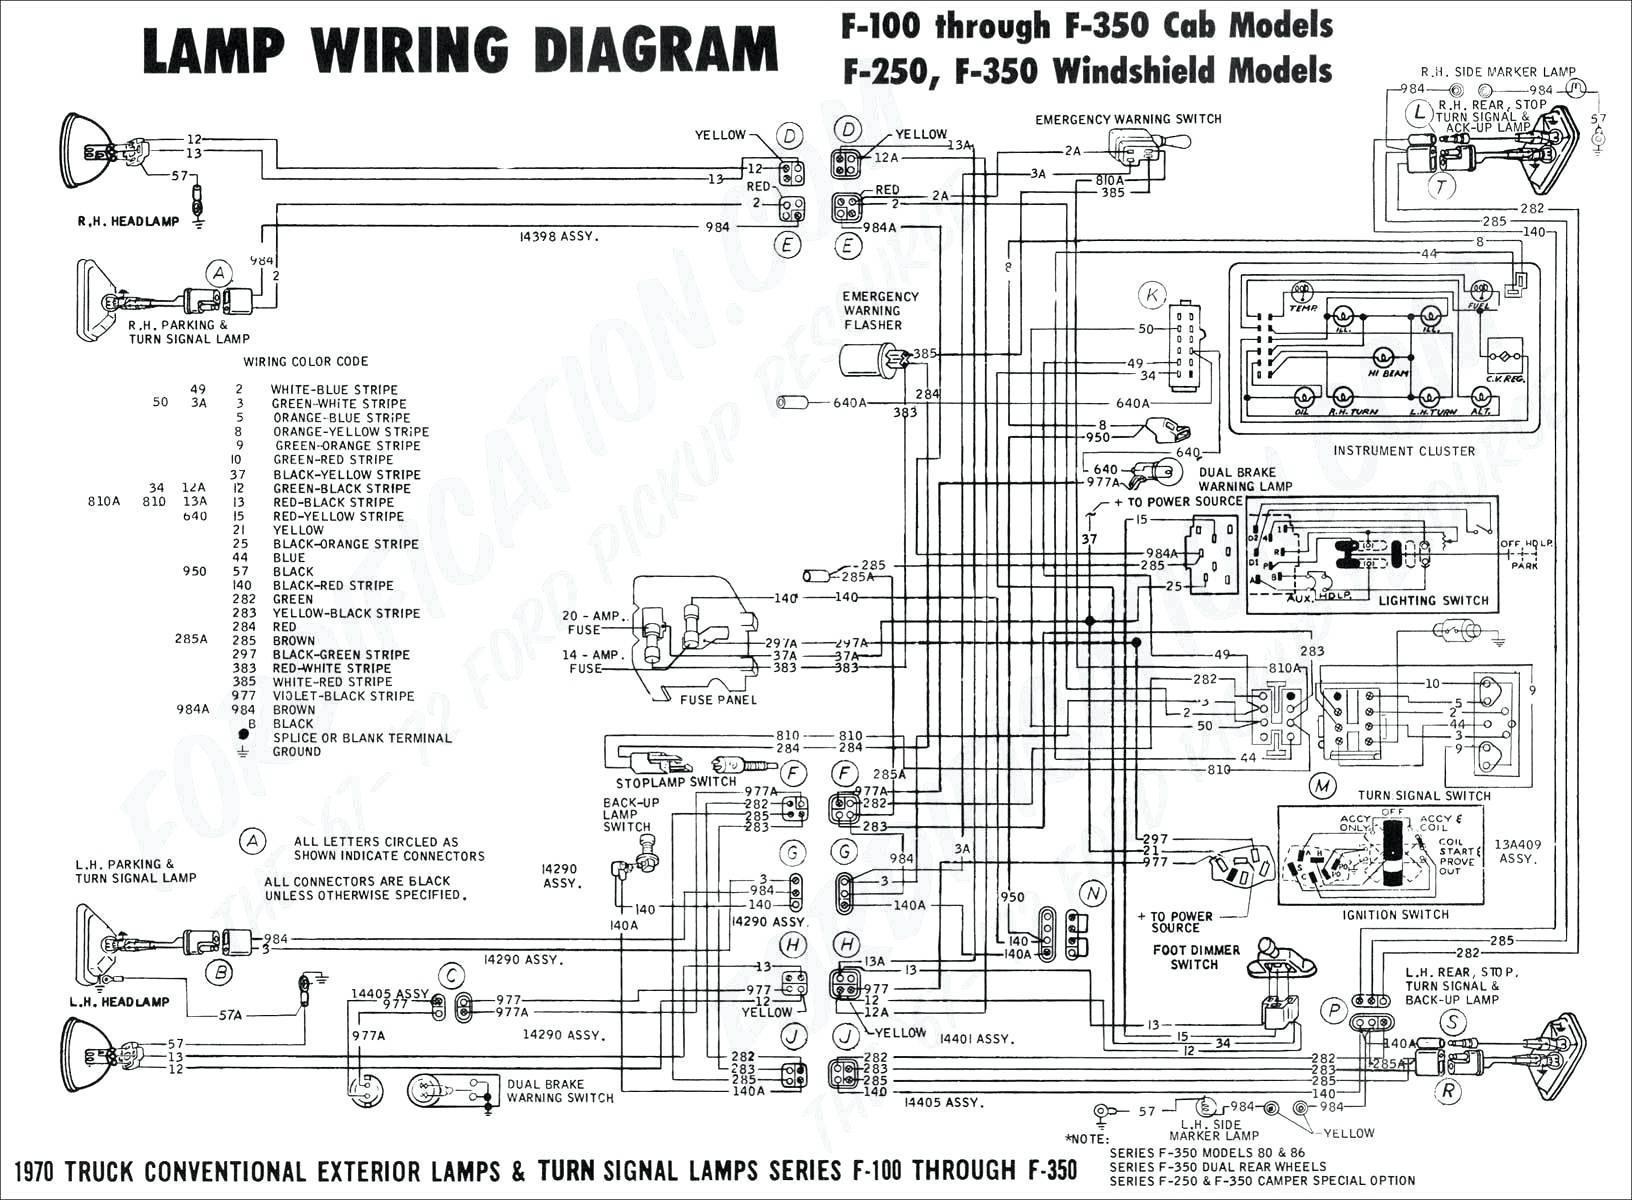 1999 Vw New Beetle Fuse Diagram Manual E Book 1999 Vw Beetle Tail Light Wiring Diagram